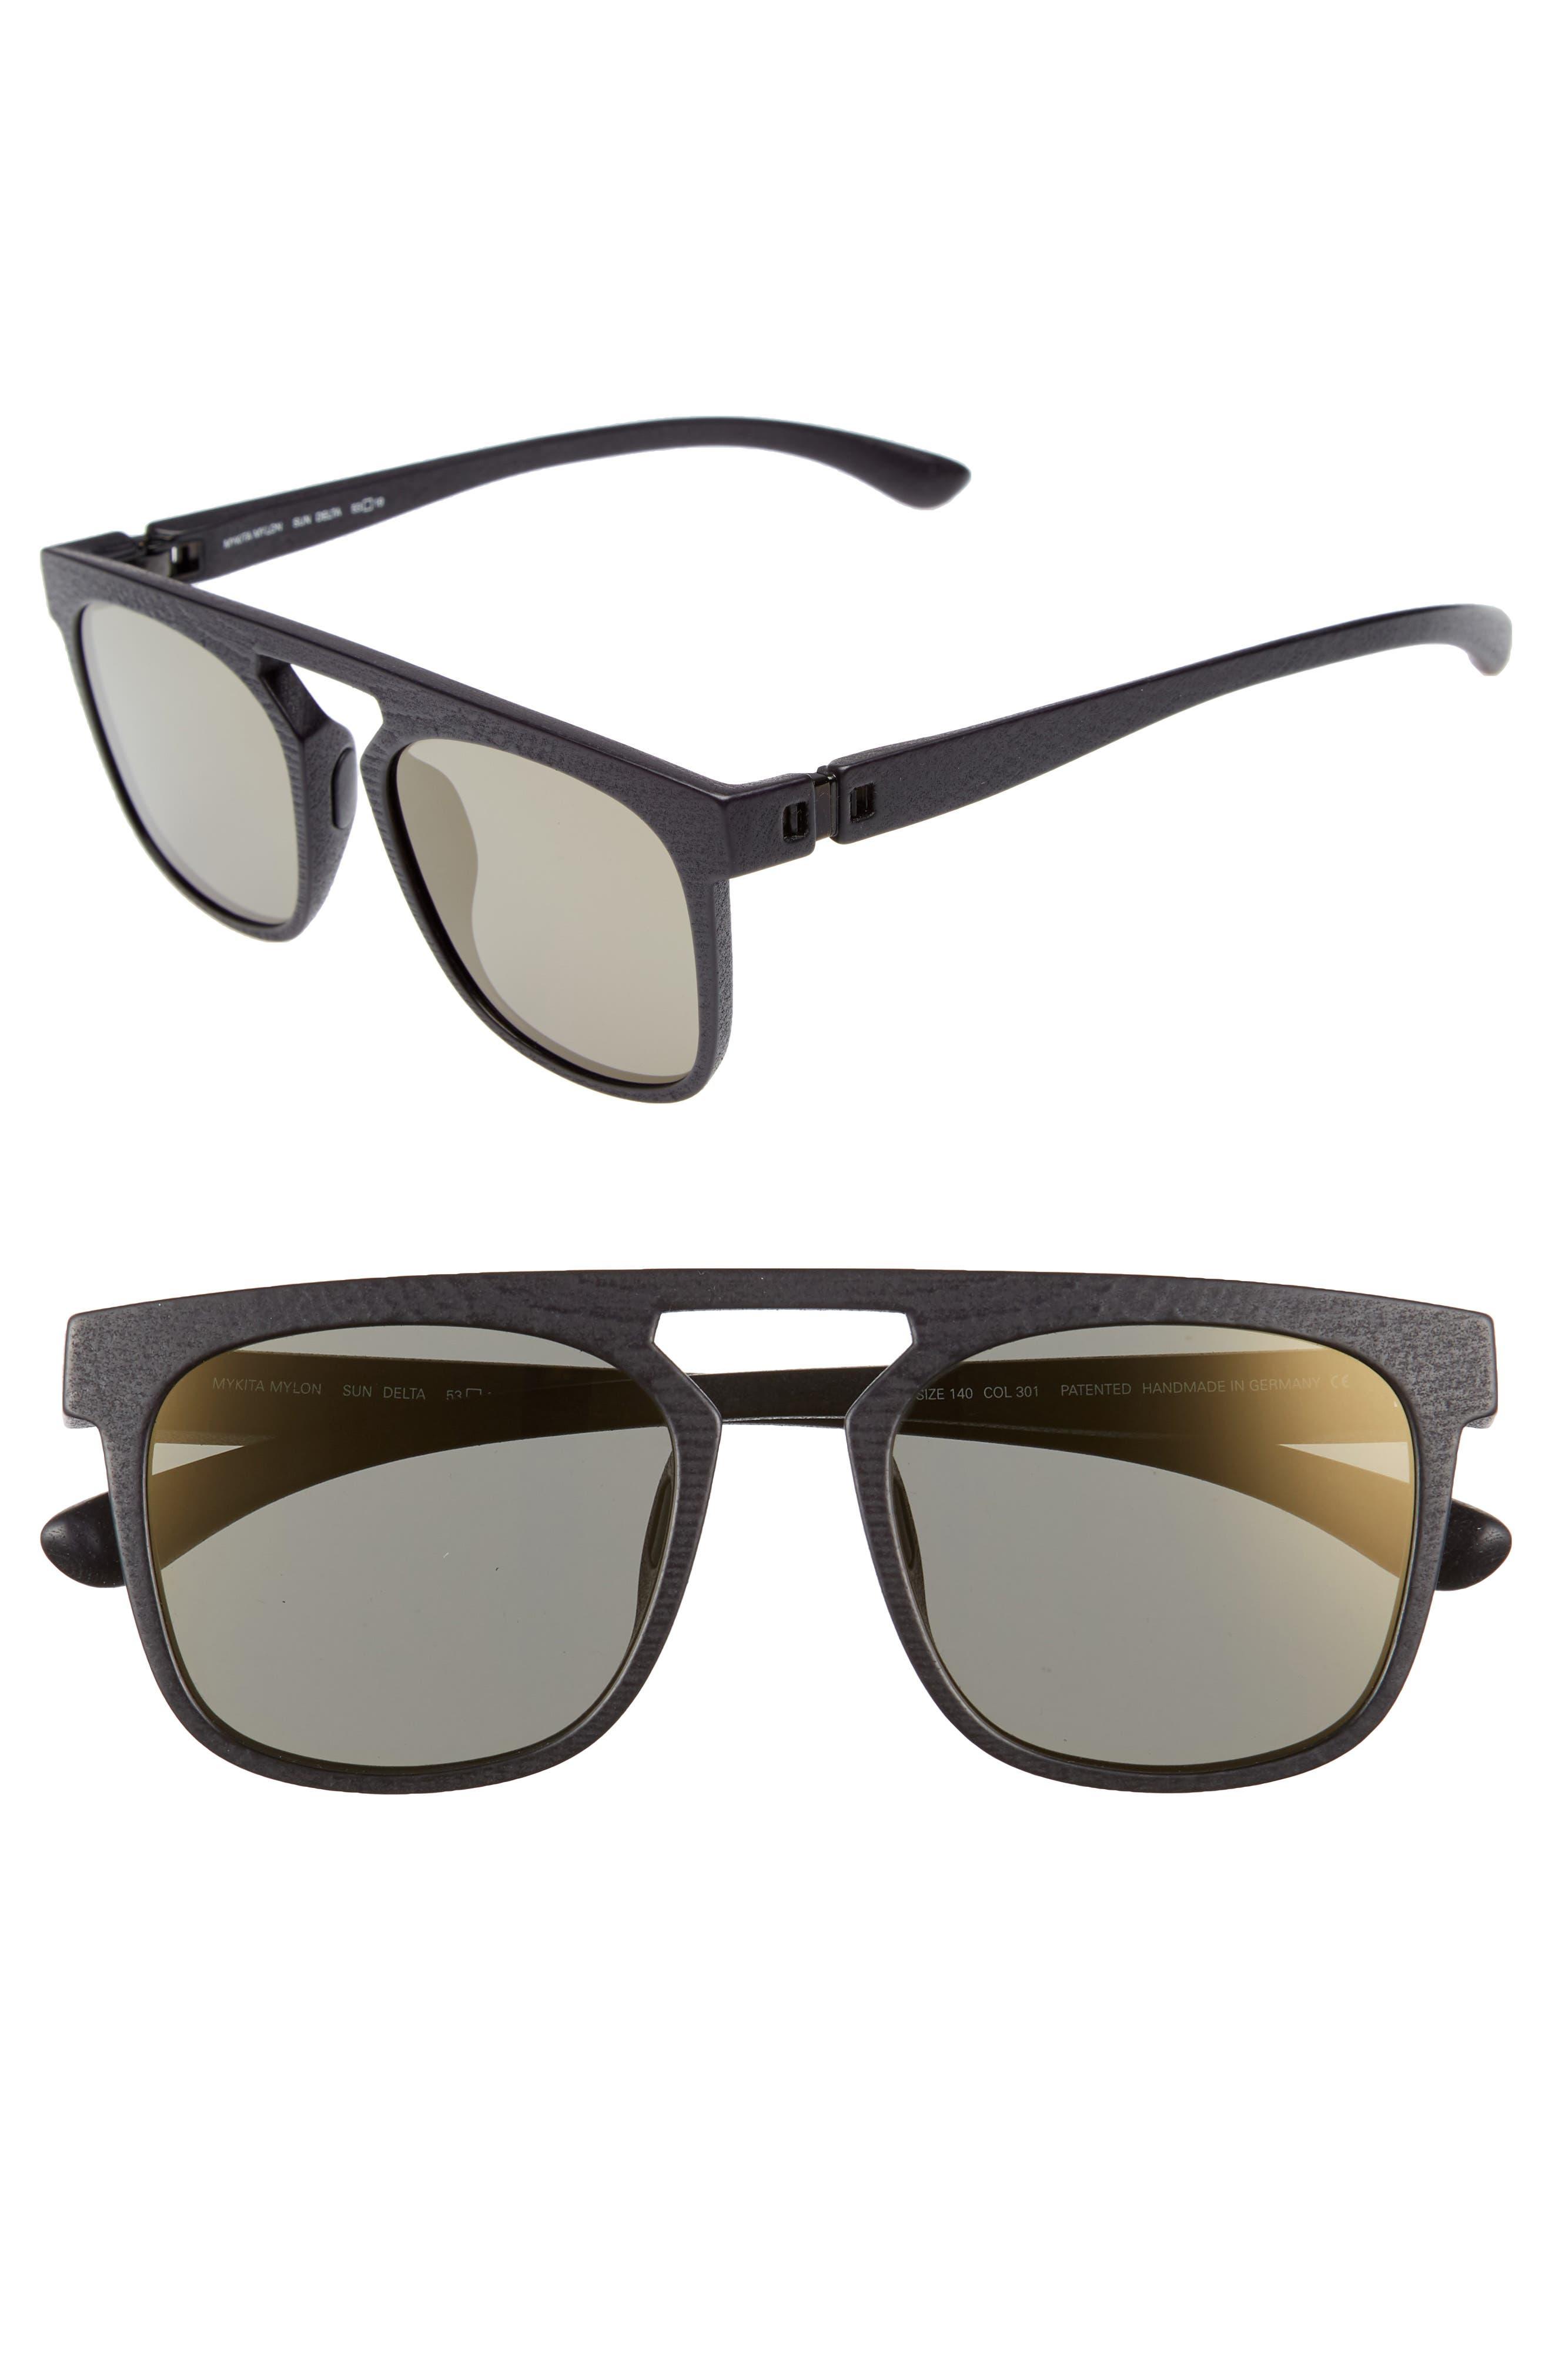 Delta 53mm Sunglasses,                             Main thumbnail 1, color,                             Pitch Black